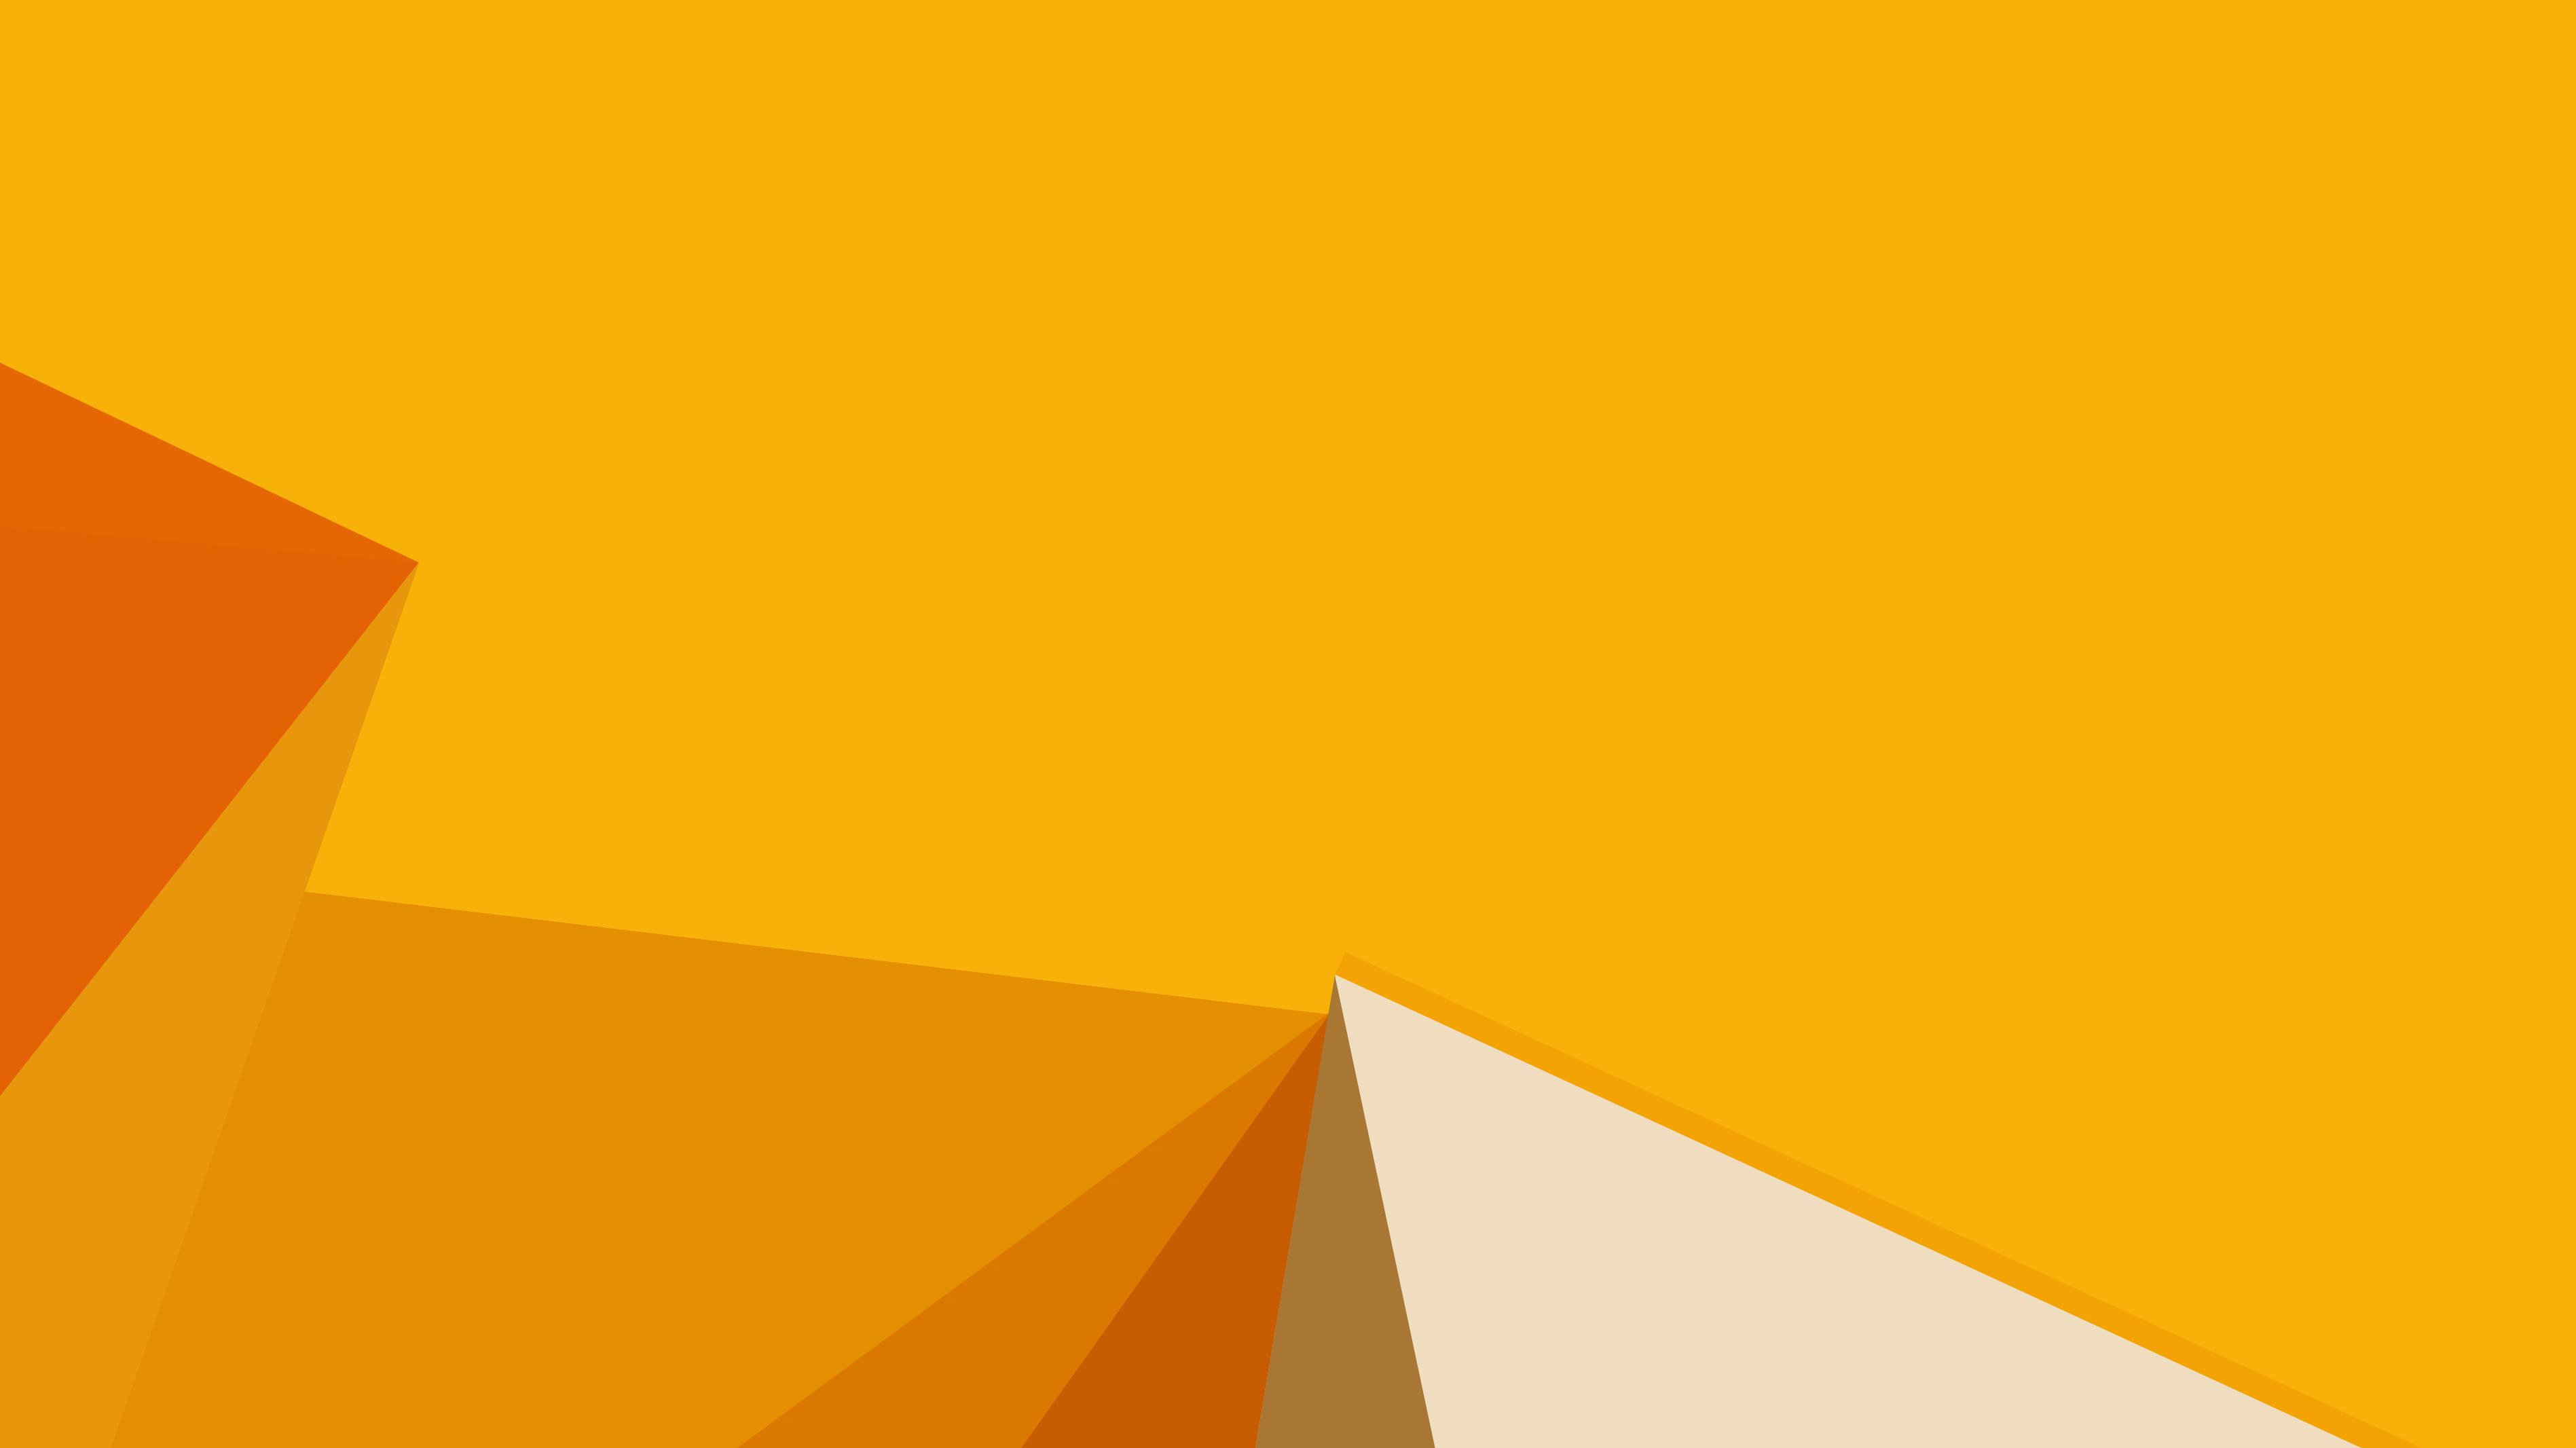 Minflat Default Windows 81 Wallpaper 4k By Dakoder On